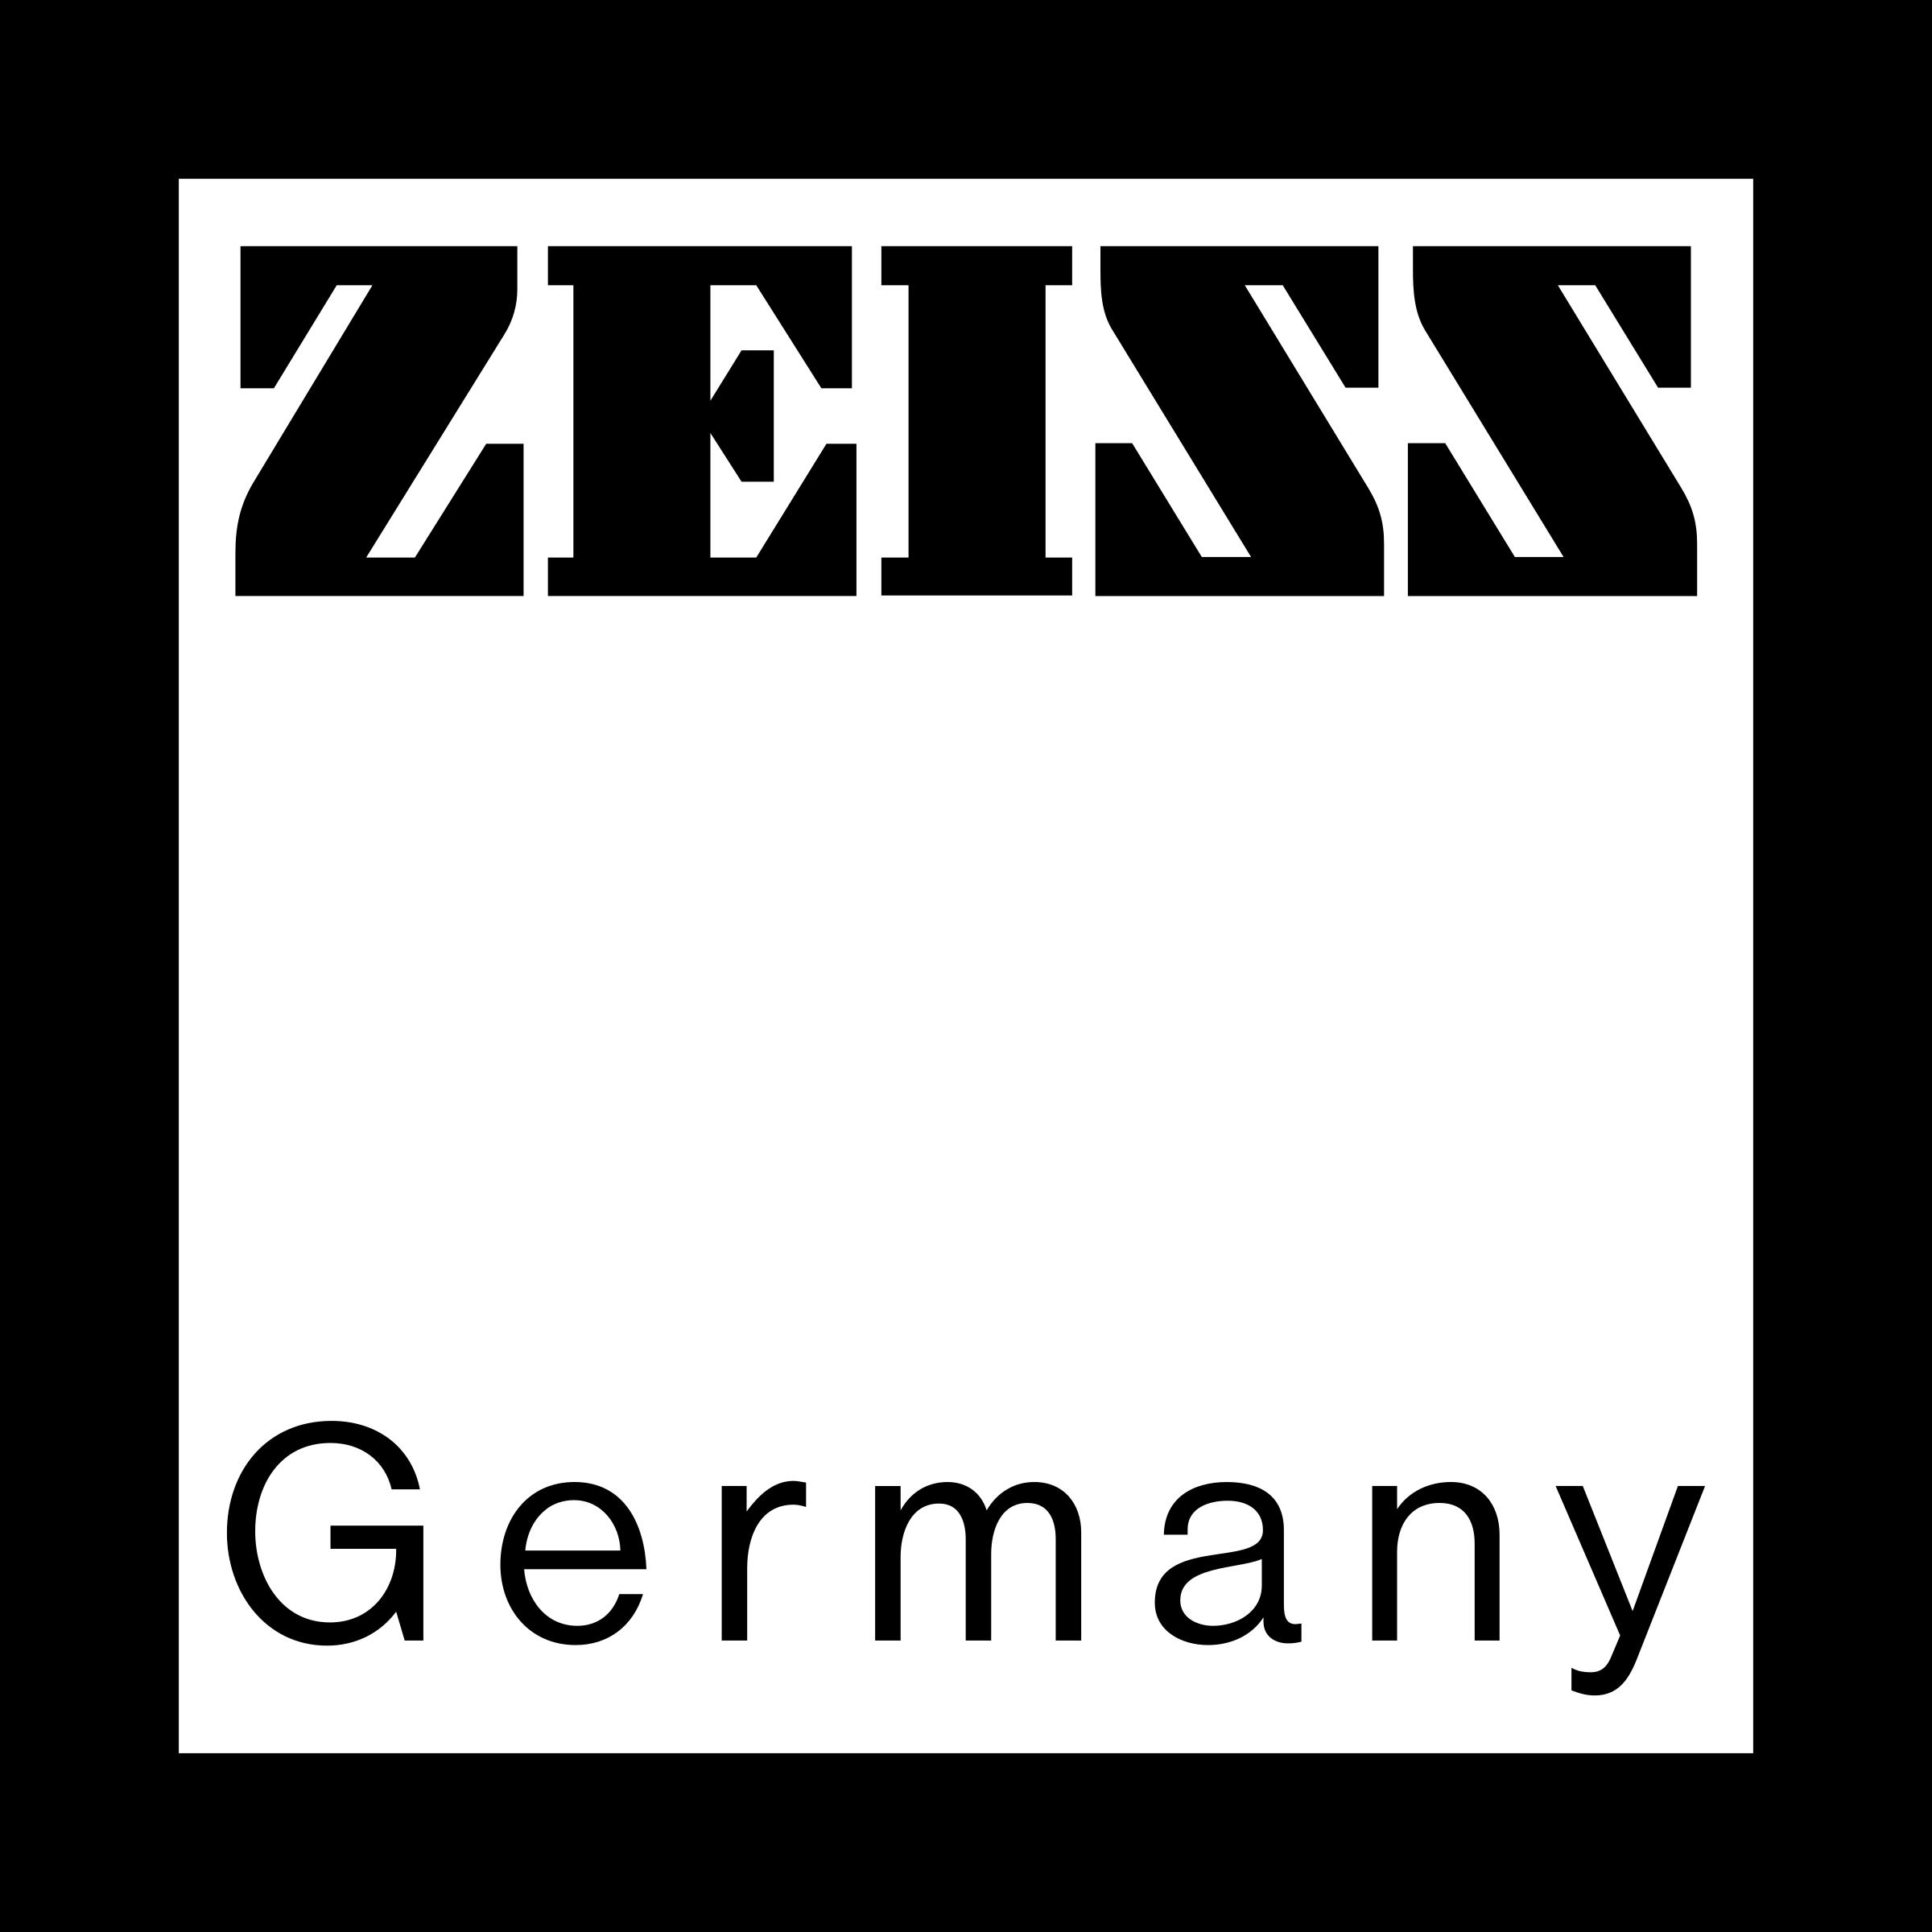 Zeiss Logo PNG Transparent & SVG Vector.